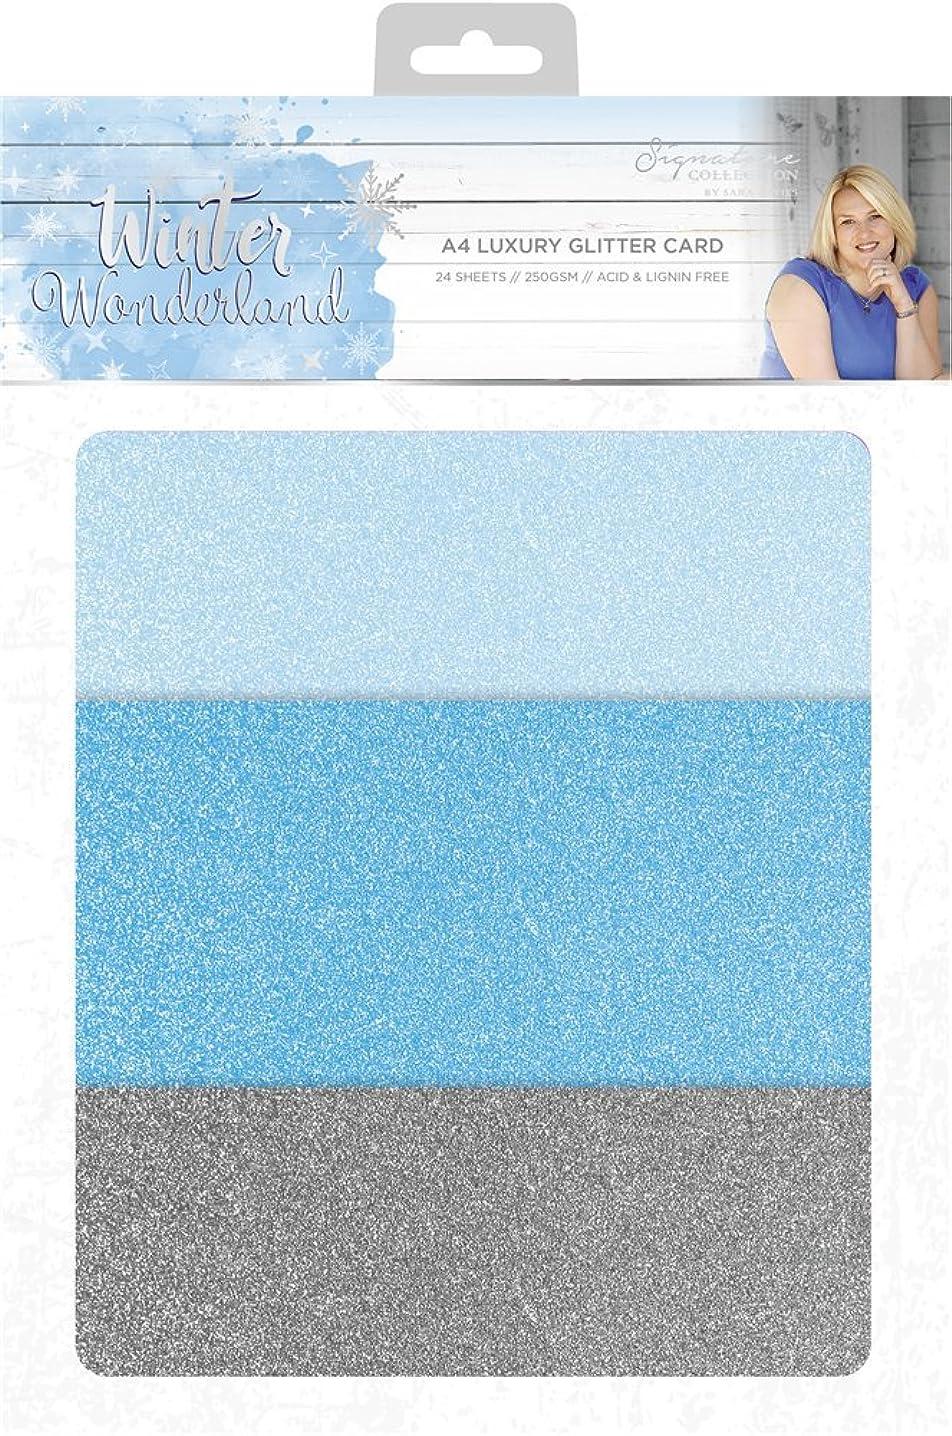 Sara Siganture S-WW Sara Signature Winter Wonderland Luxury Glitter Card, Mixed